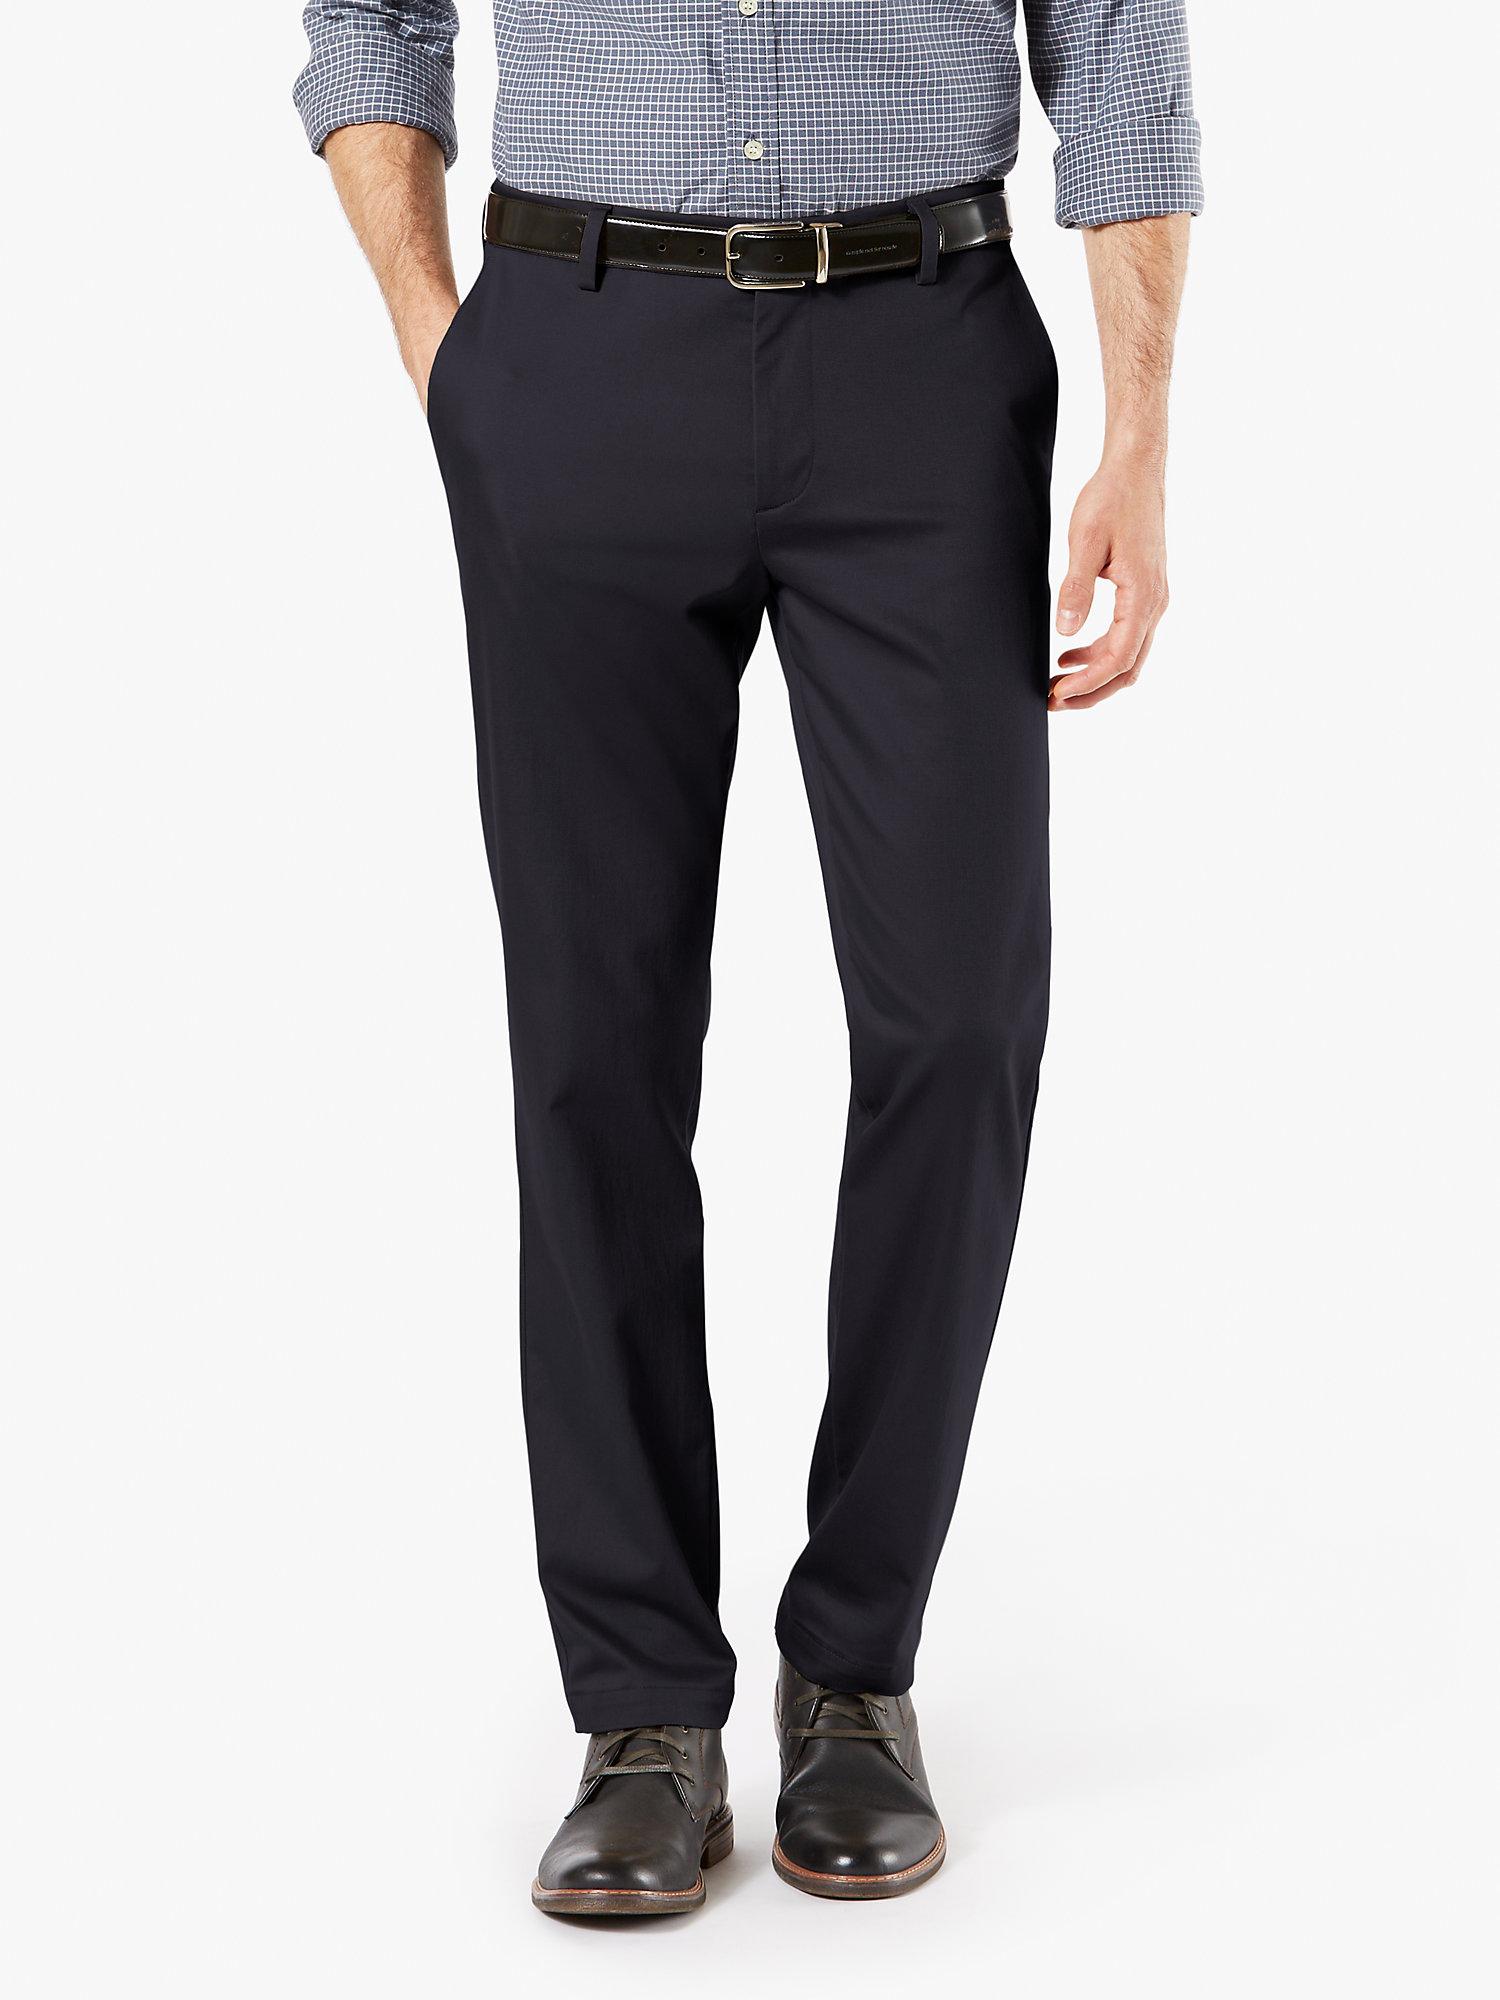 Men's Big & Tall Modern Tapered Fit Signature Khaki Lux Cotton Stretch Pants